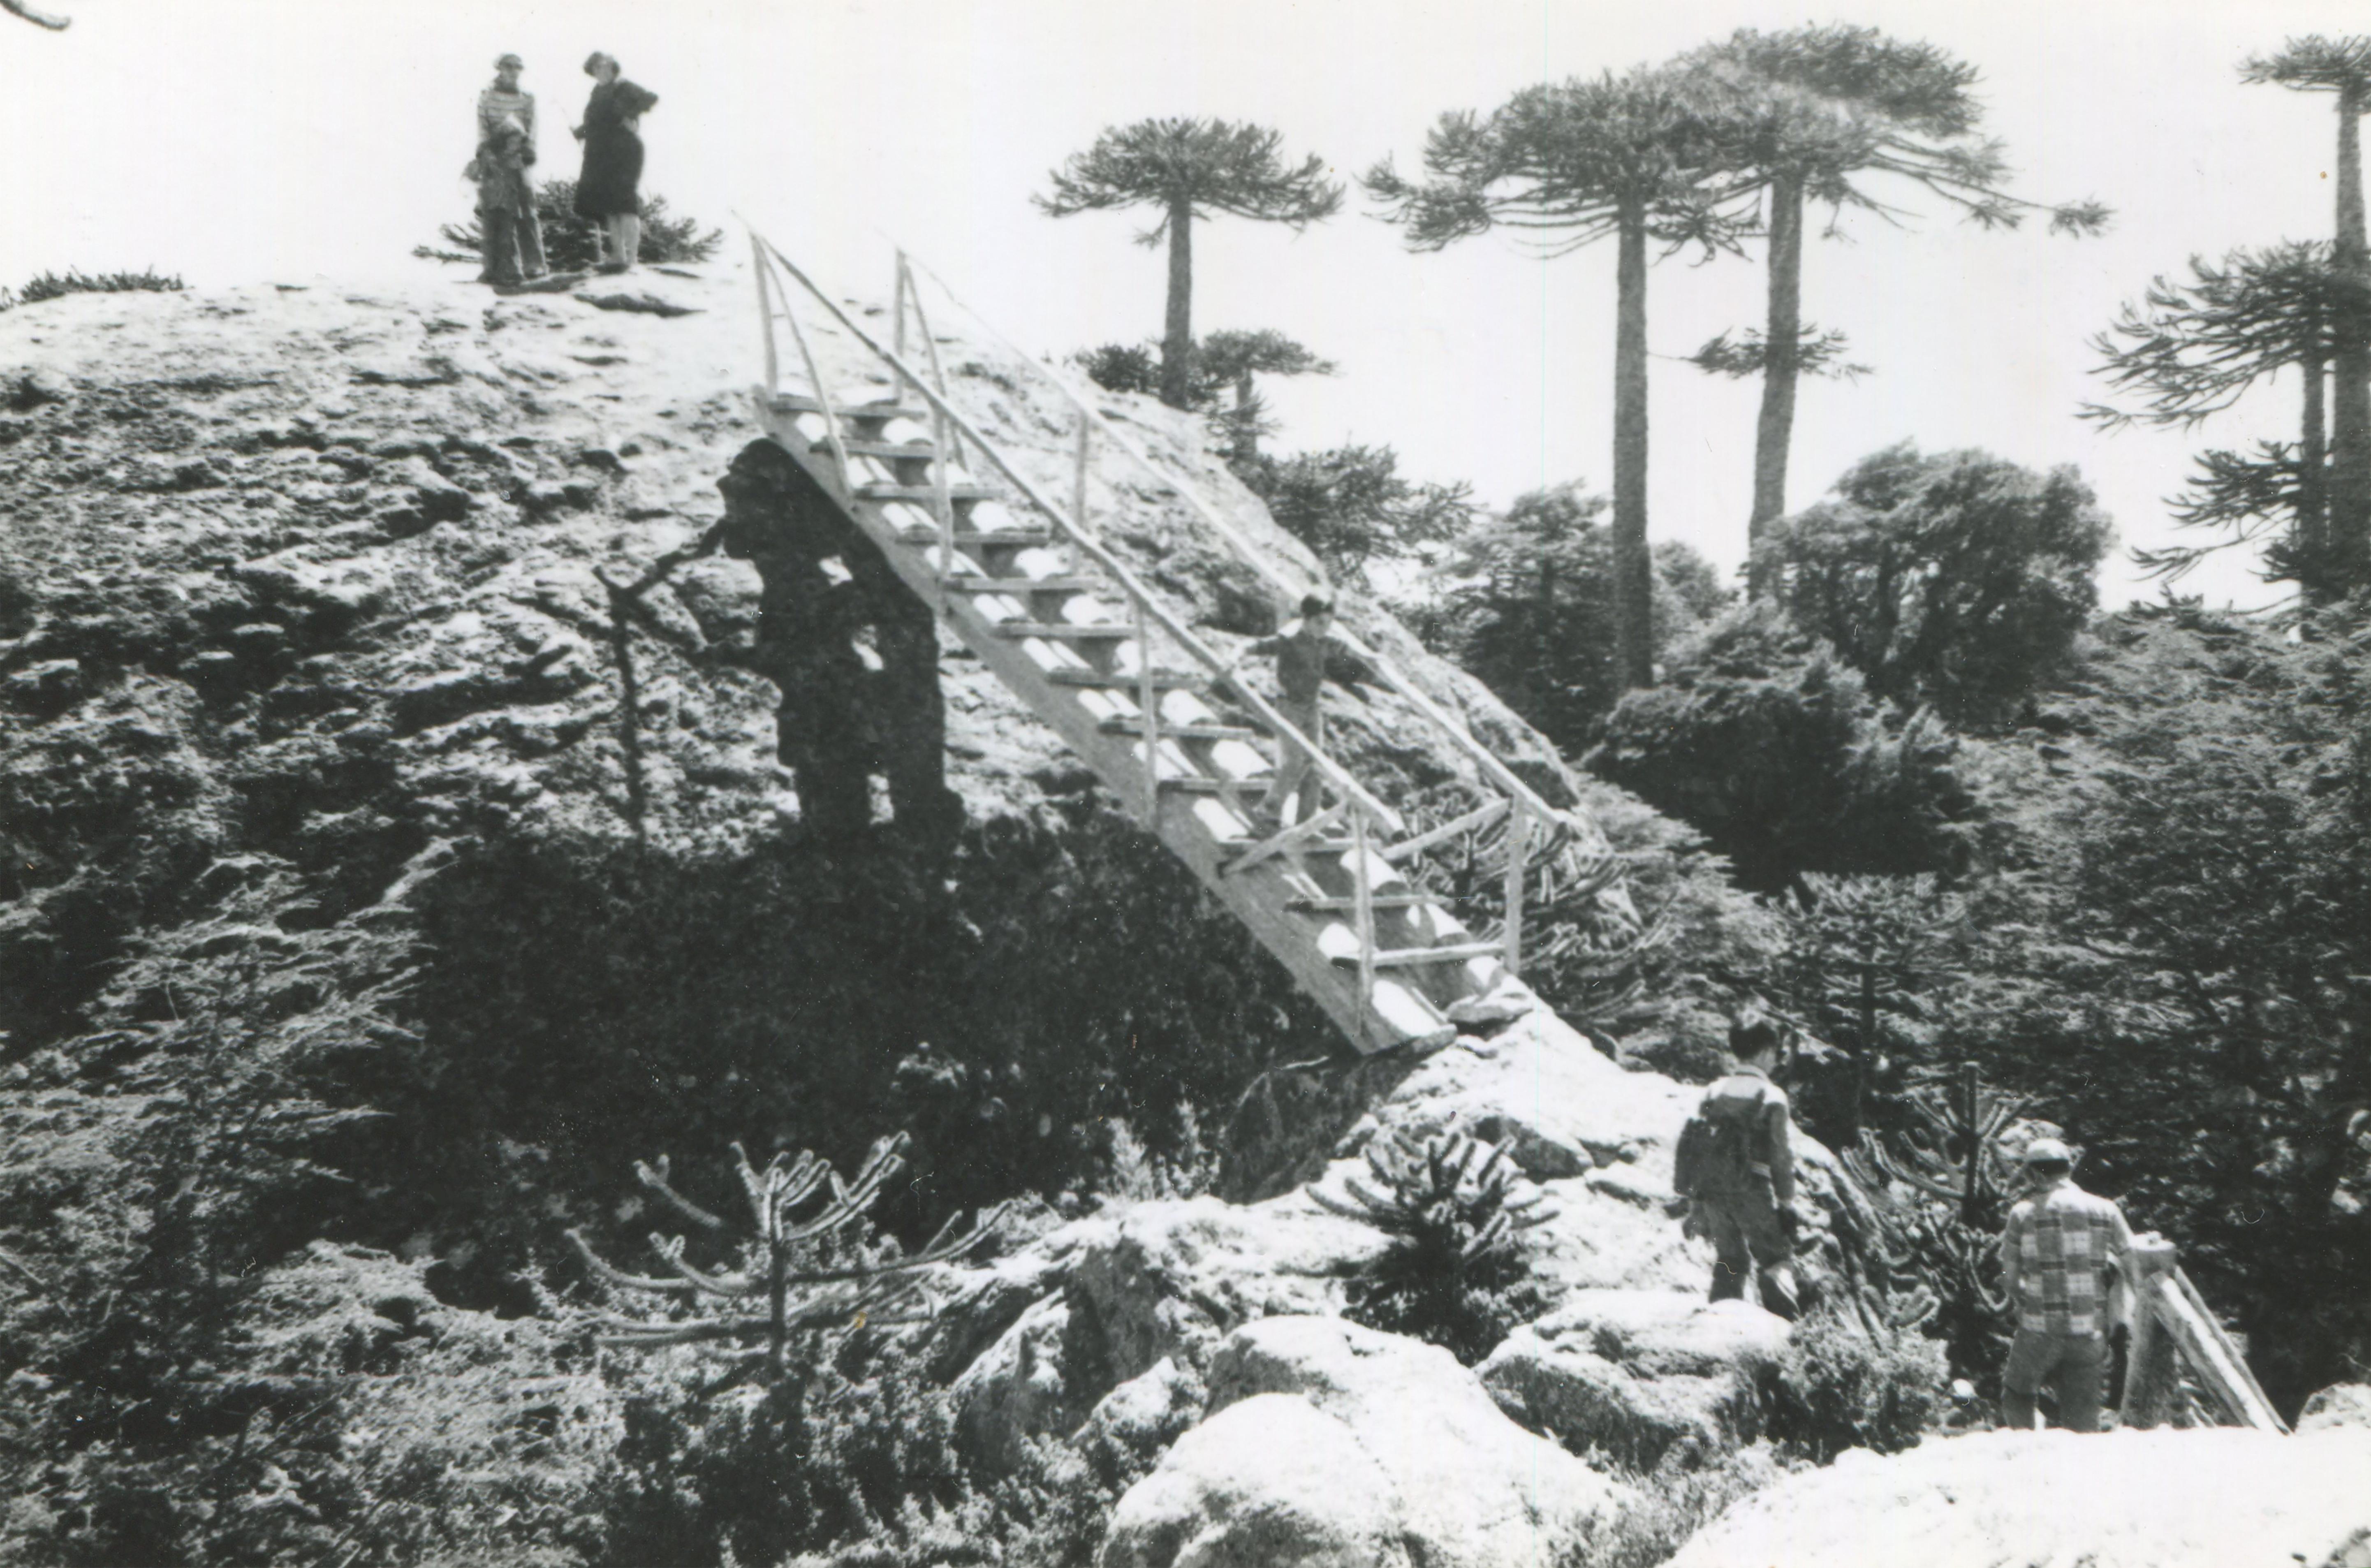 Enterreno - Fotos históricas de chile - fotos antiguas de Chile - Parque Nacional Nahuelbuta en 1950